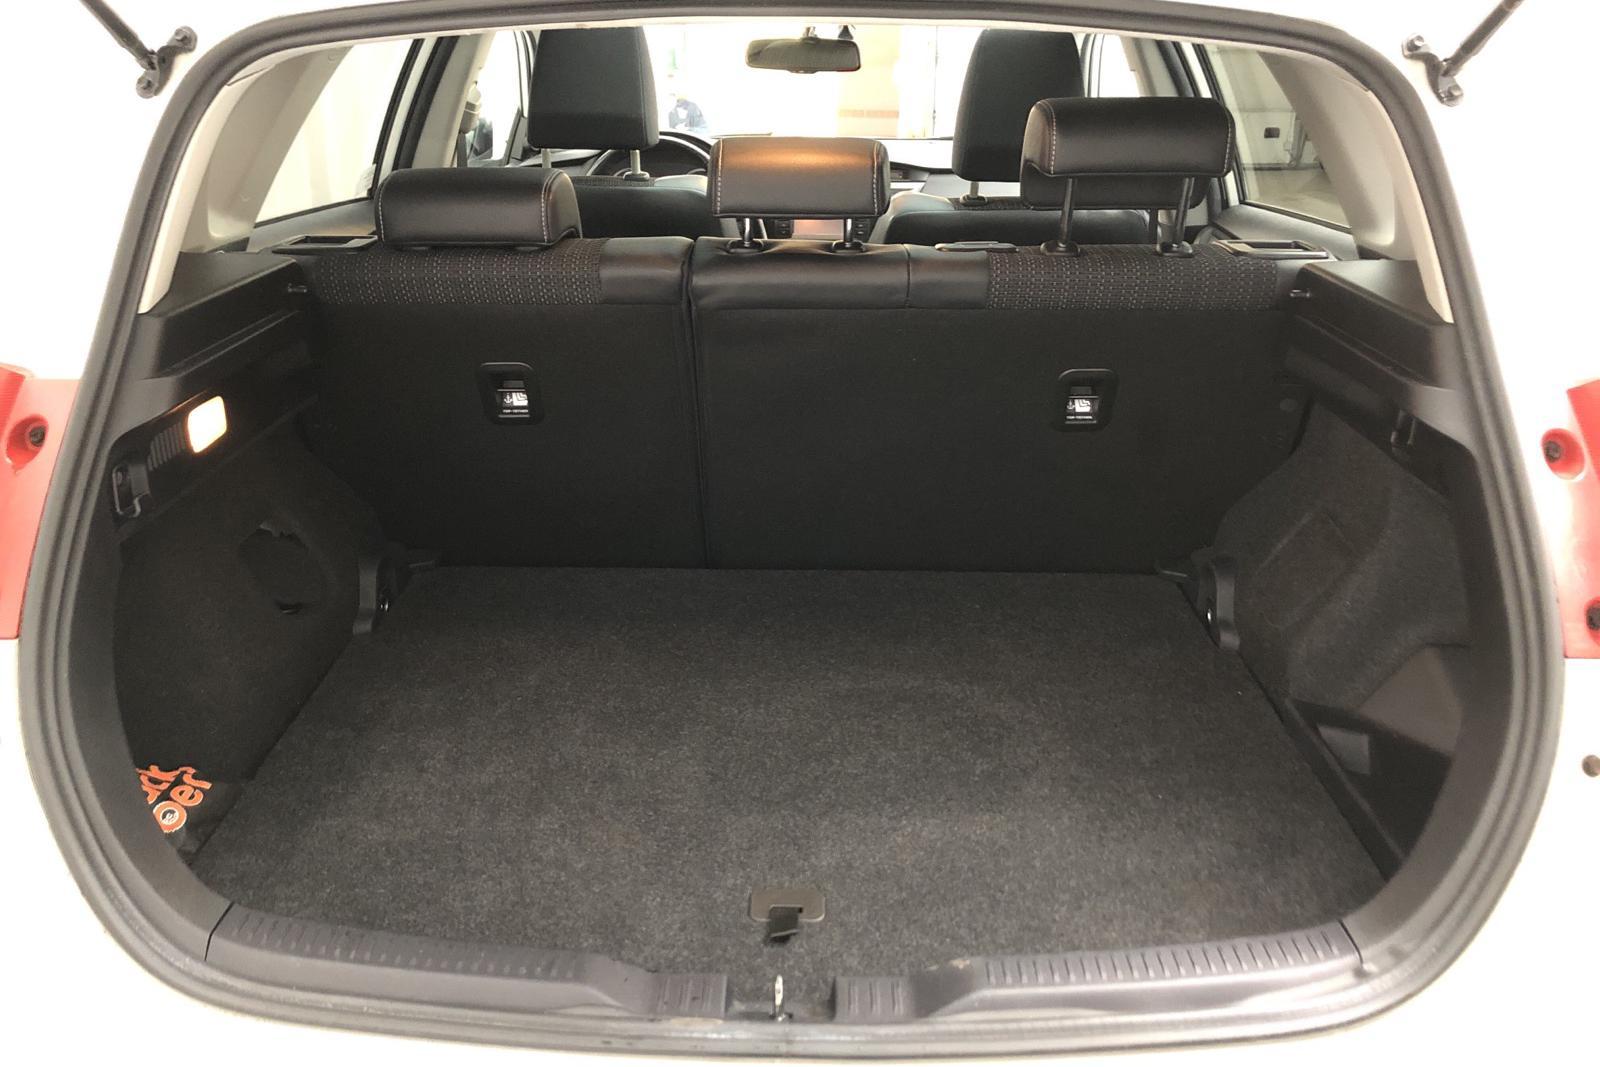 Toyota Auris 1.8 HSD 5dr (99hk) - 114 220 km - Automatic - white - 2013